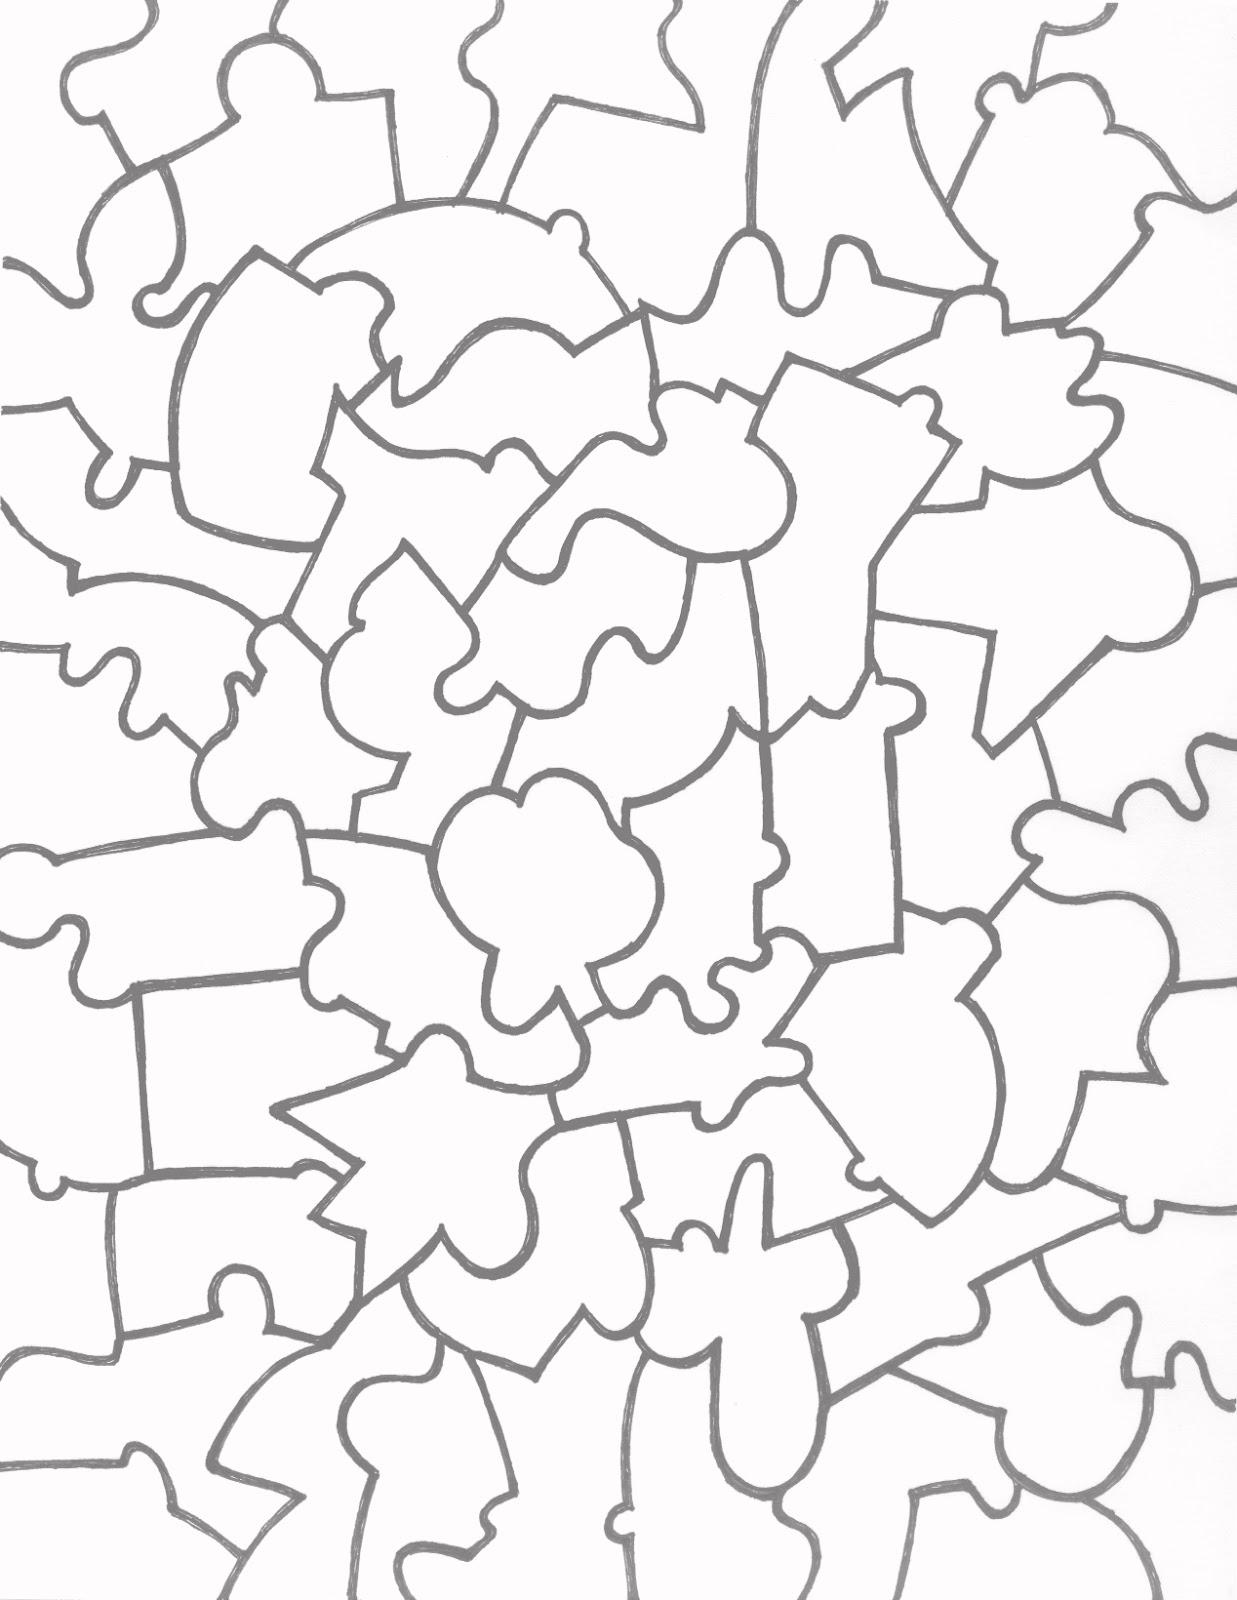 Printable Blank Puzzle